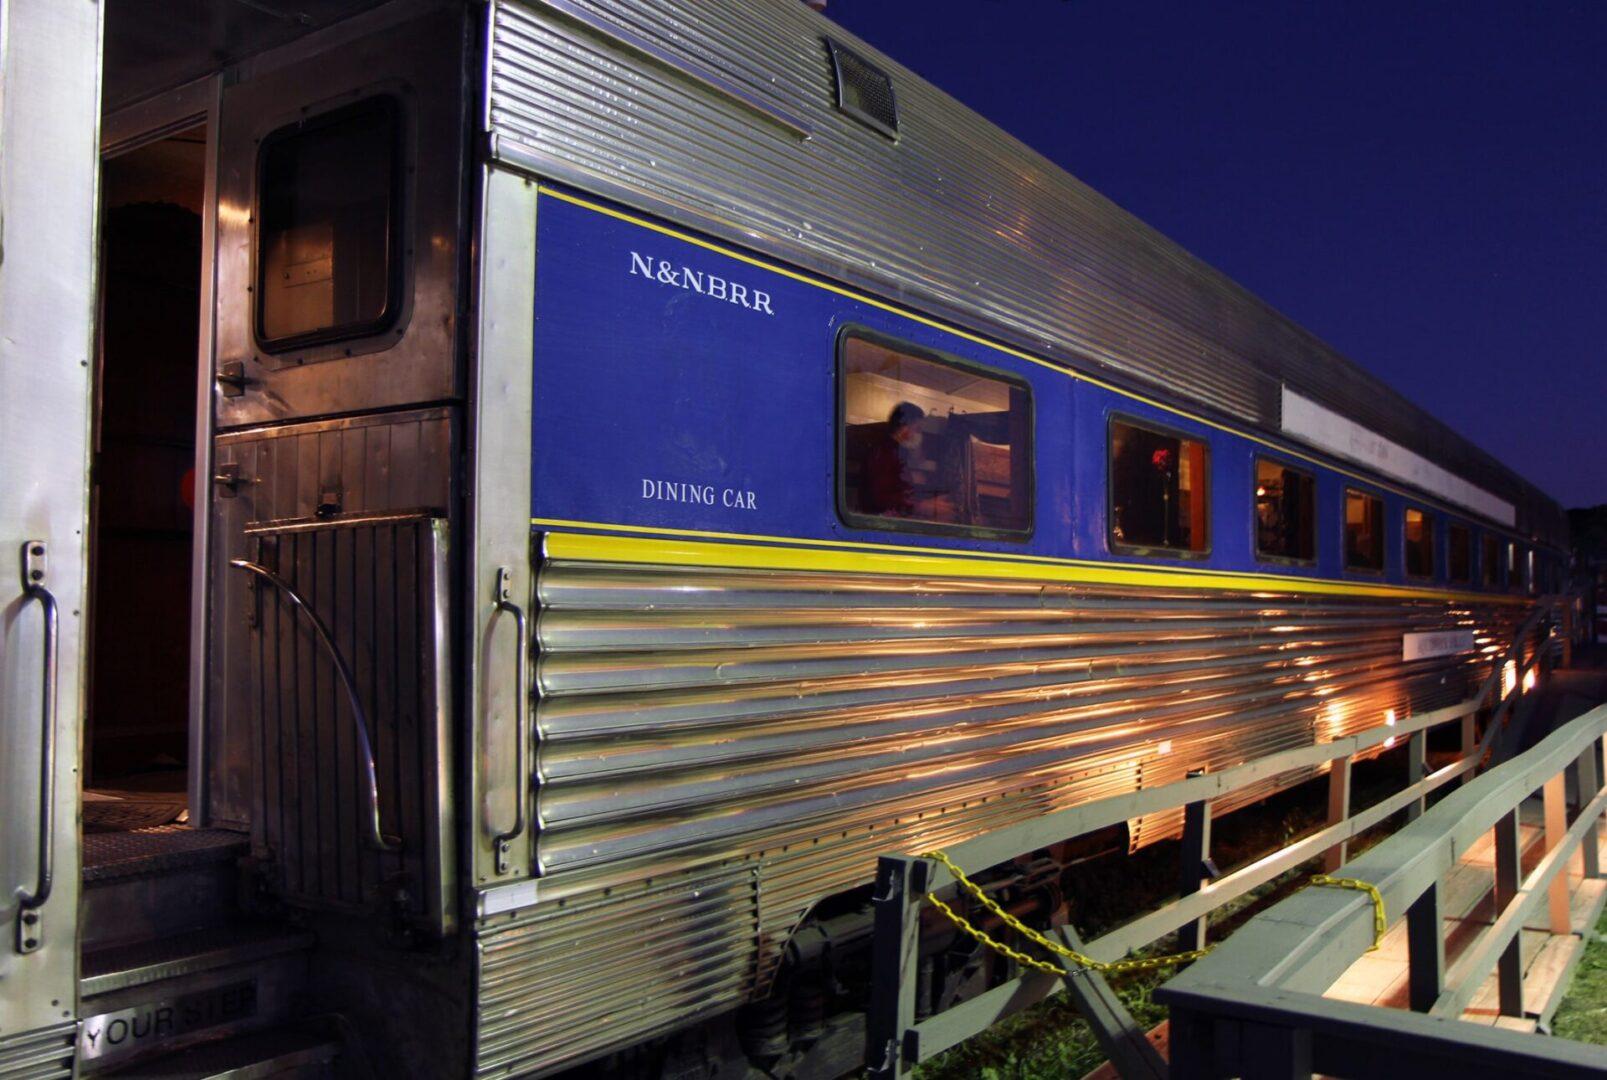 Grand Bellevue train in the evening